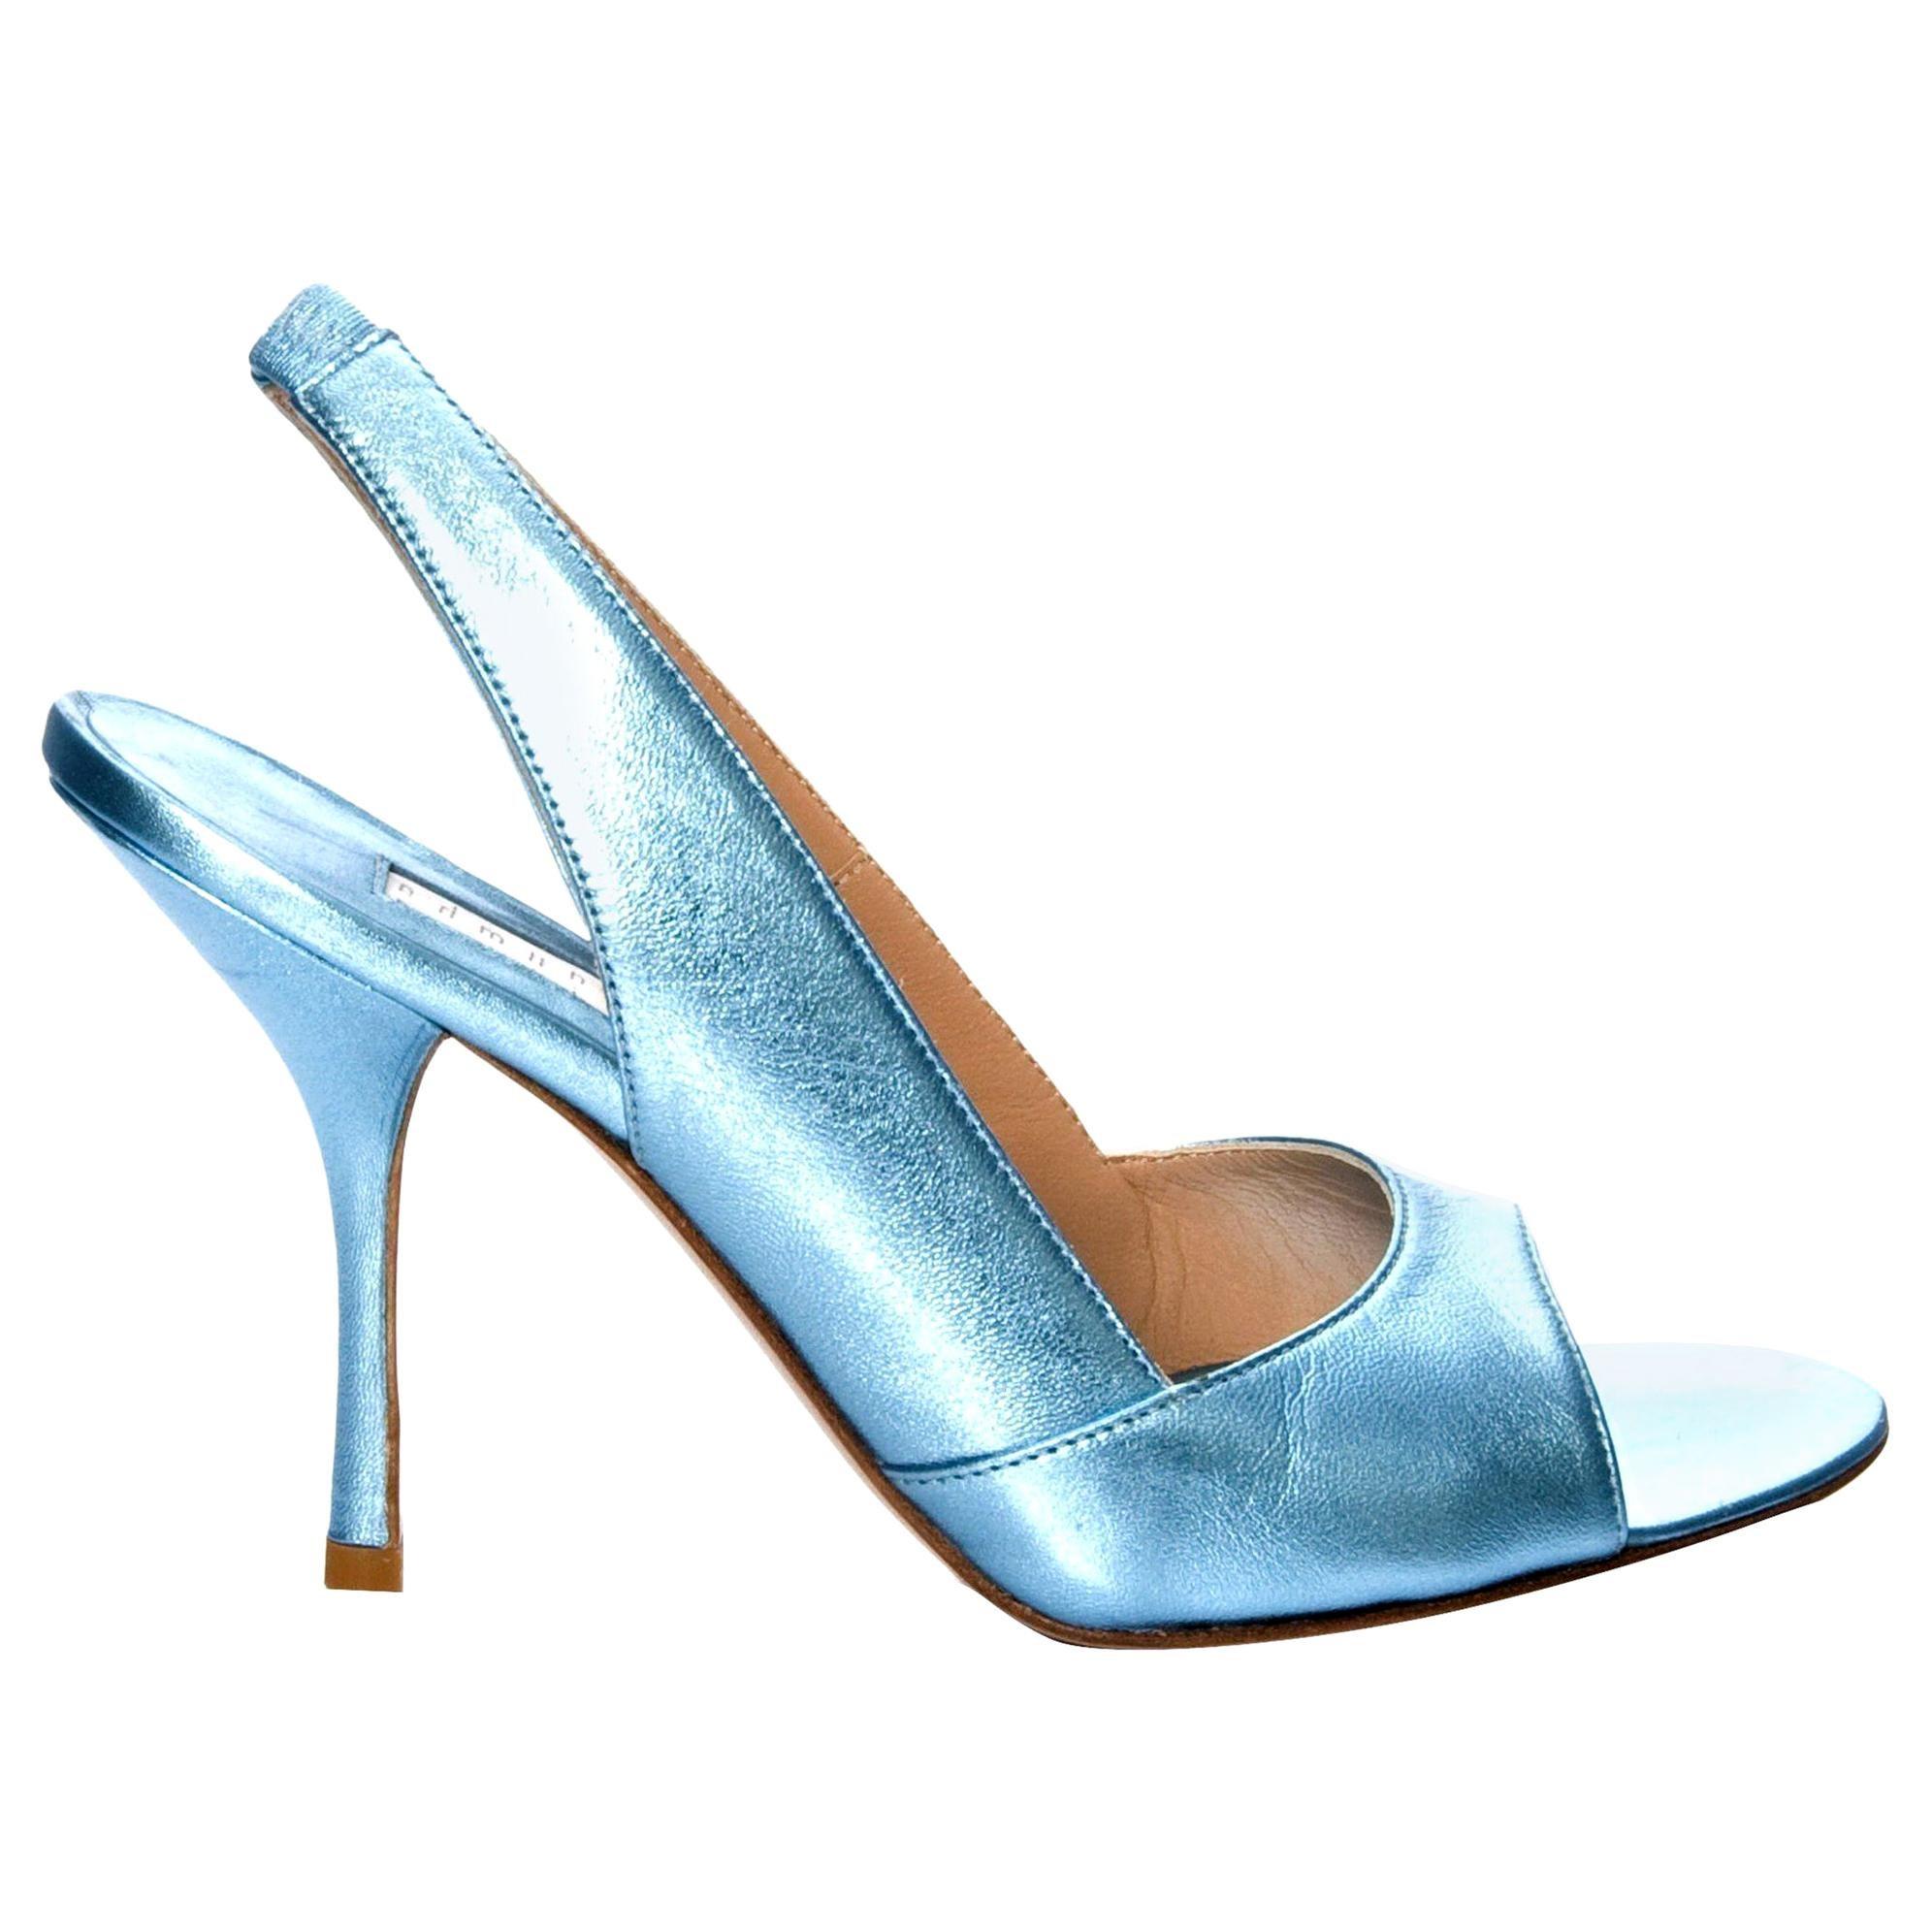 New Edmundo Castillo Blue Metallic Napa Leather Sling Heels Sz 7.5